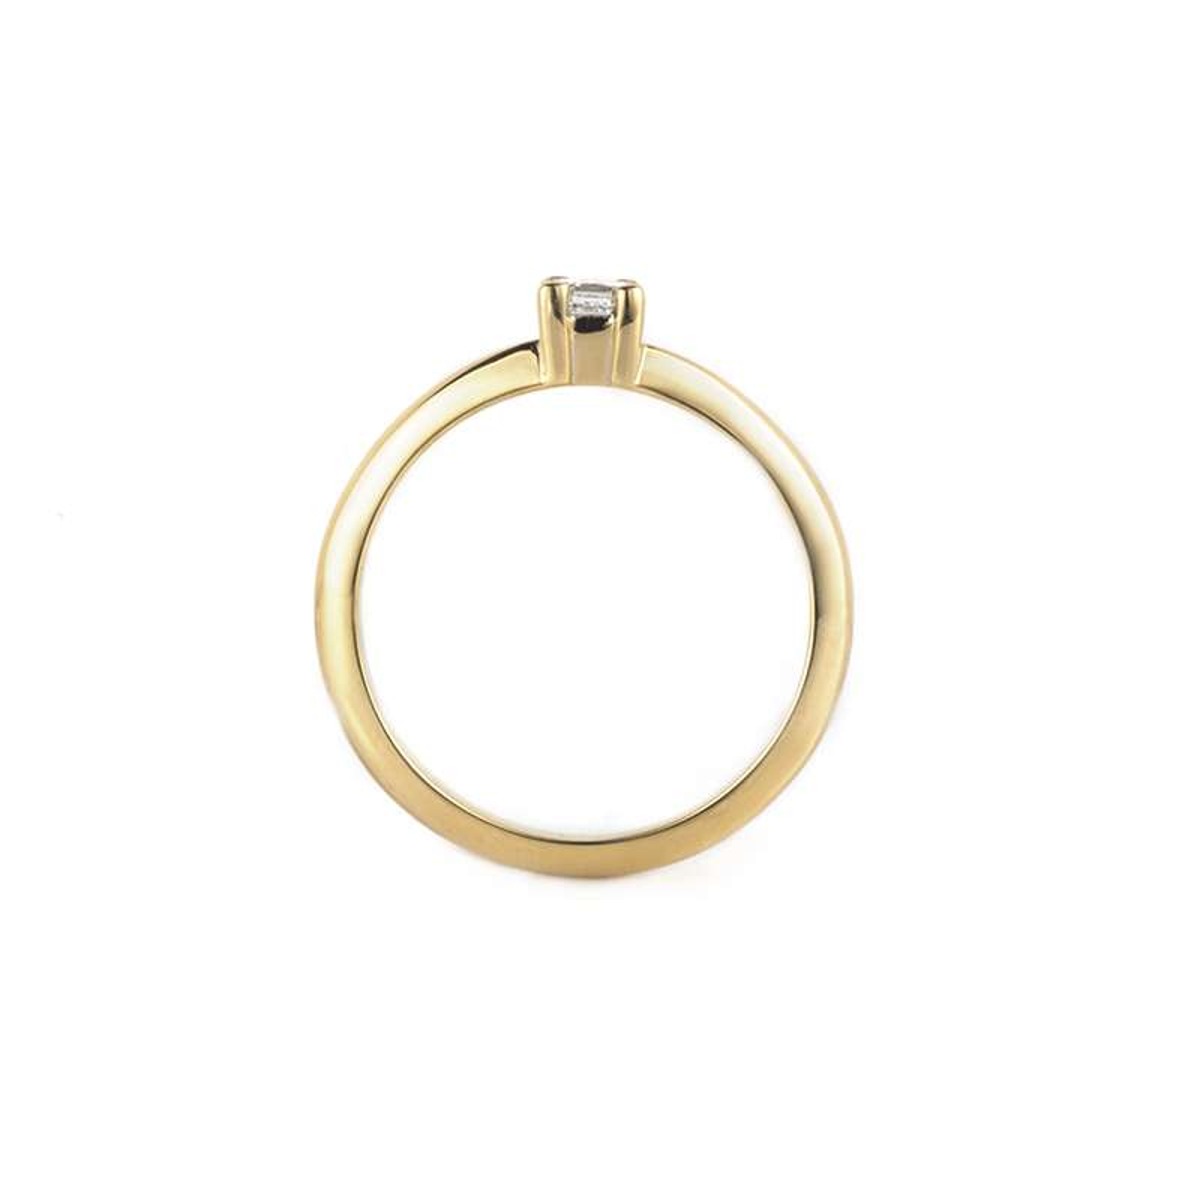 18k Yellow Gold Princess Cut Diamond Ring 0.23ct H/VS2